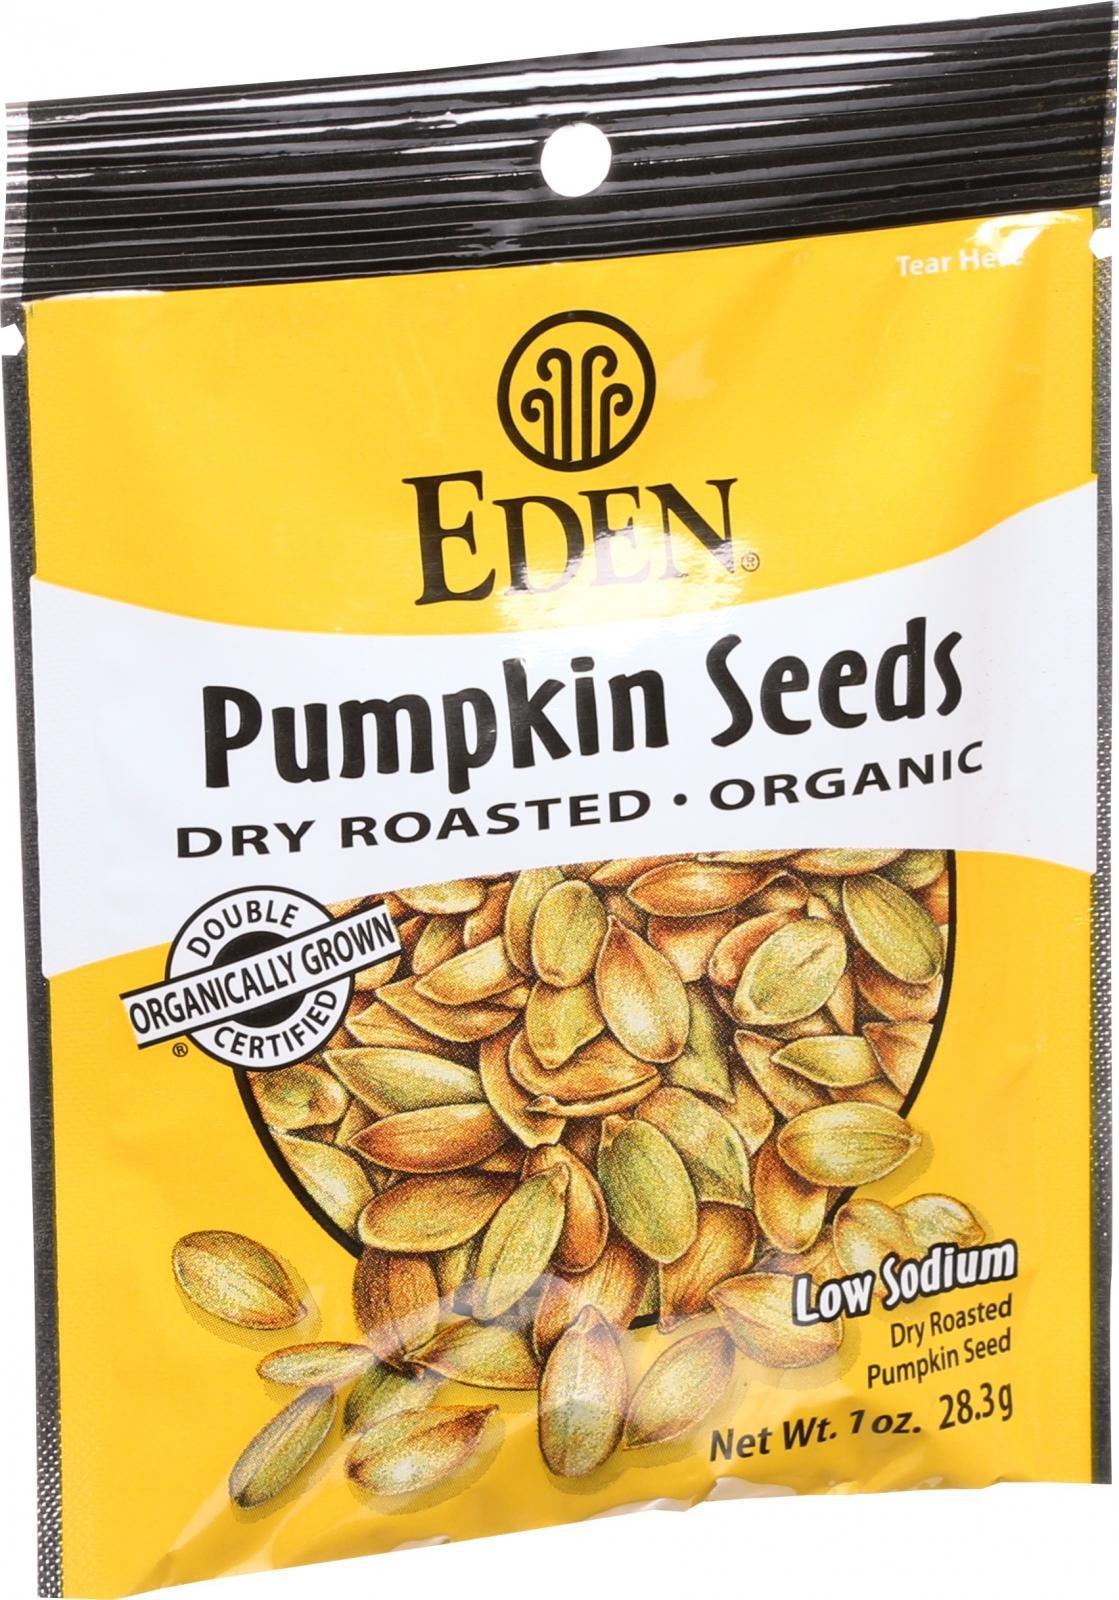 Eden Foods Organic Pocket Snacks - Pumpkin Seeds - Dry Roasted and Salted - 1 oz - Case of 12